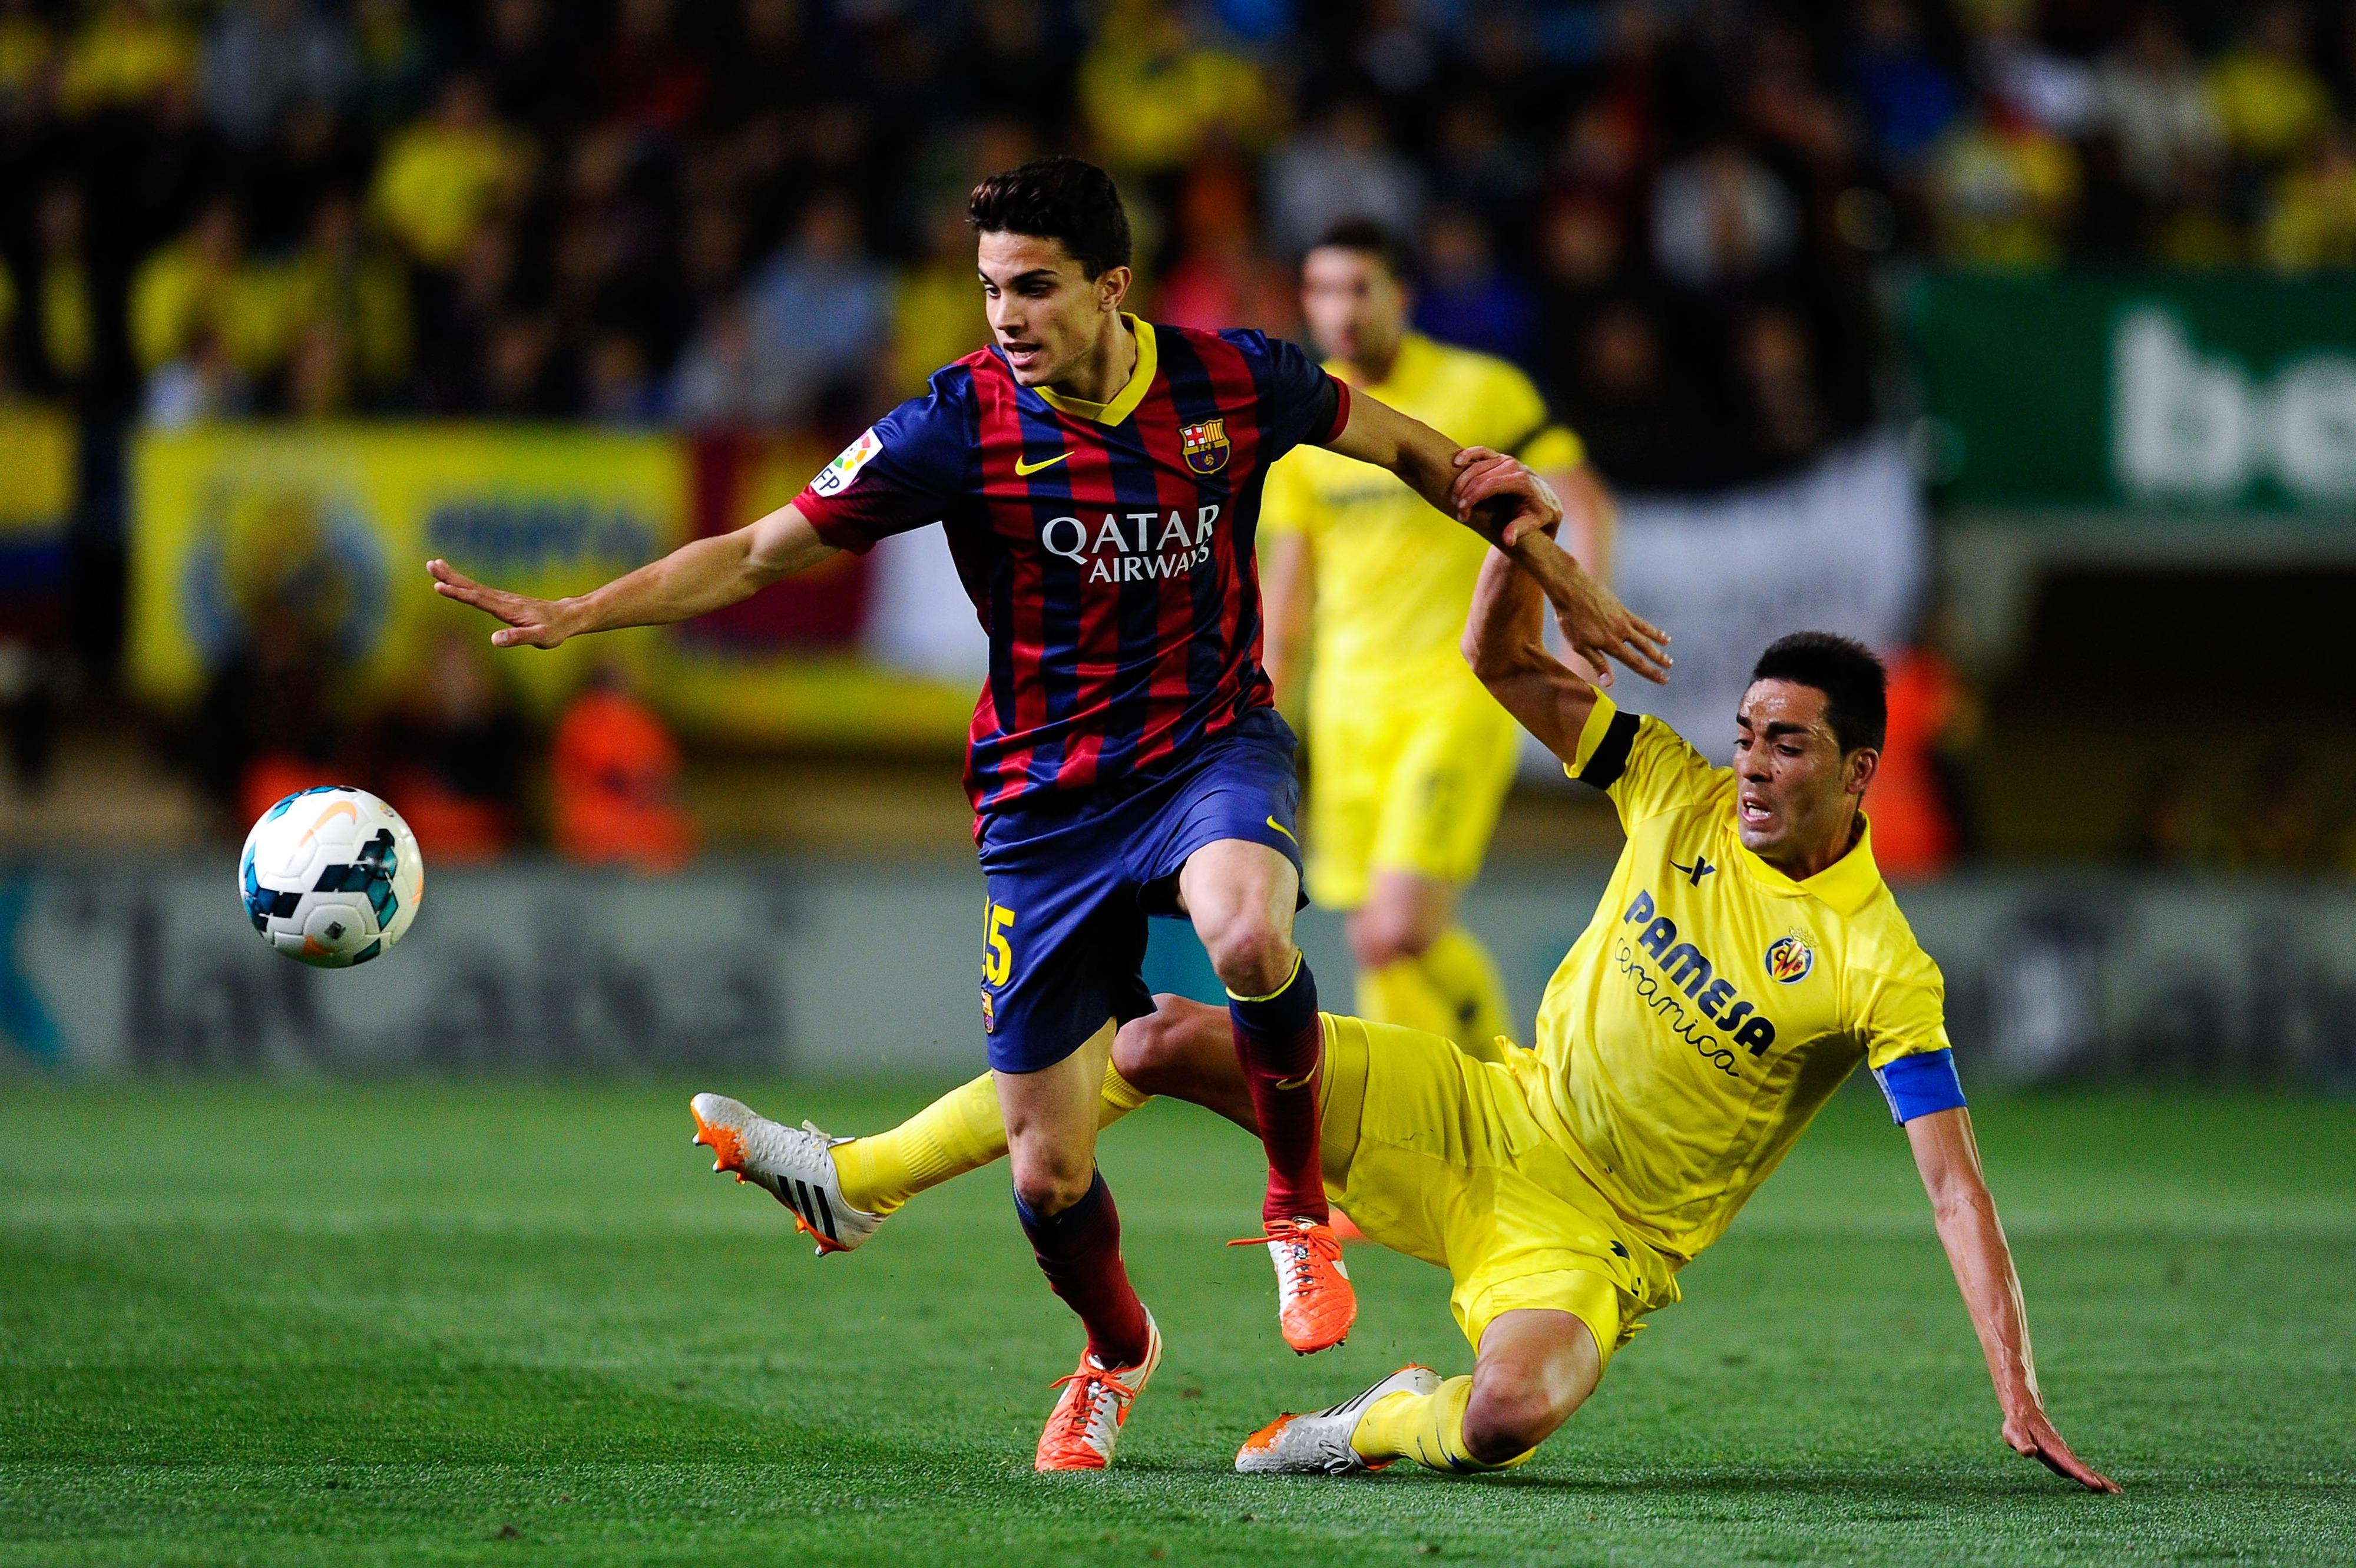 Villarreal vs. Barcelona: Final score 2-3, OGs are the Yellow Submarine's undoing